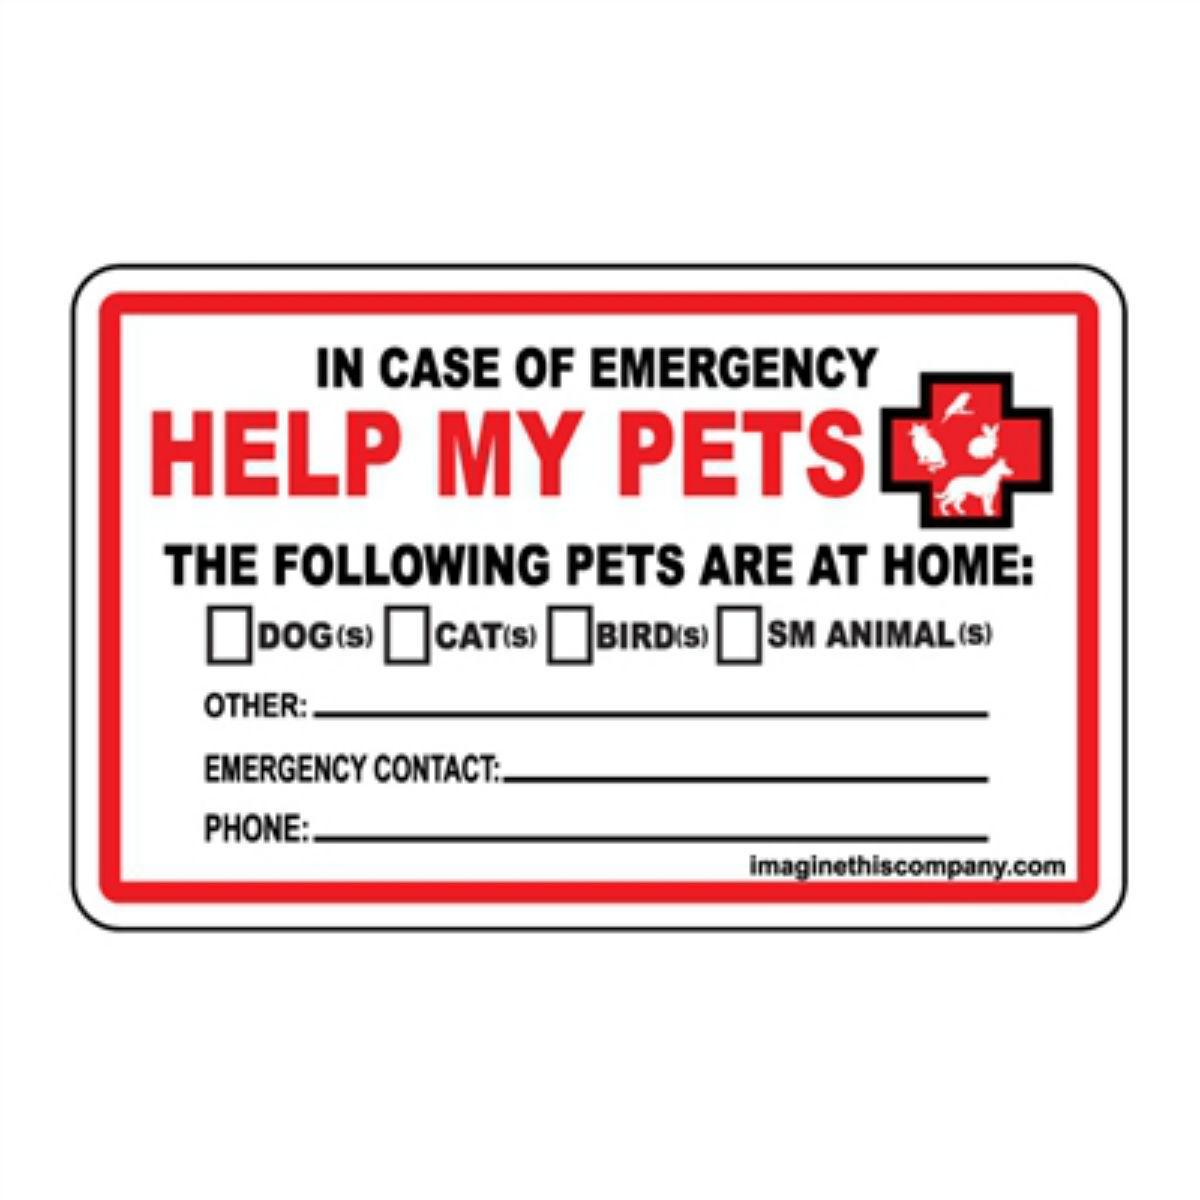 Emergency Wallet Cards - Help My Pets